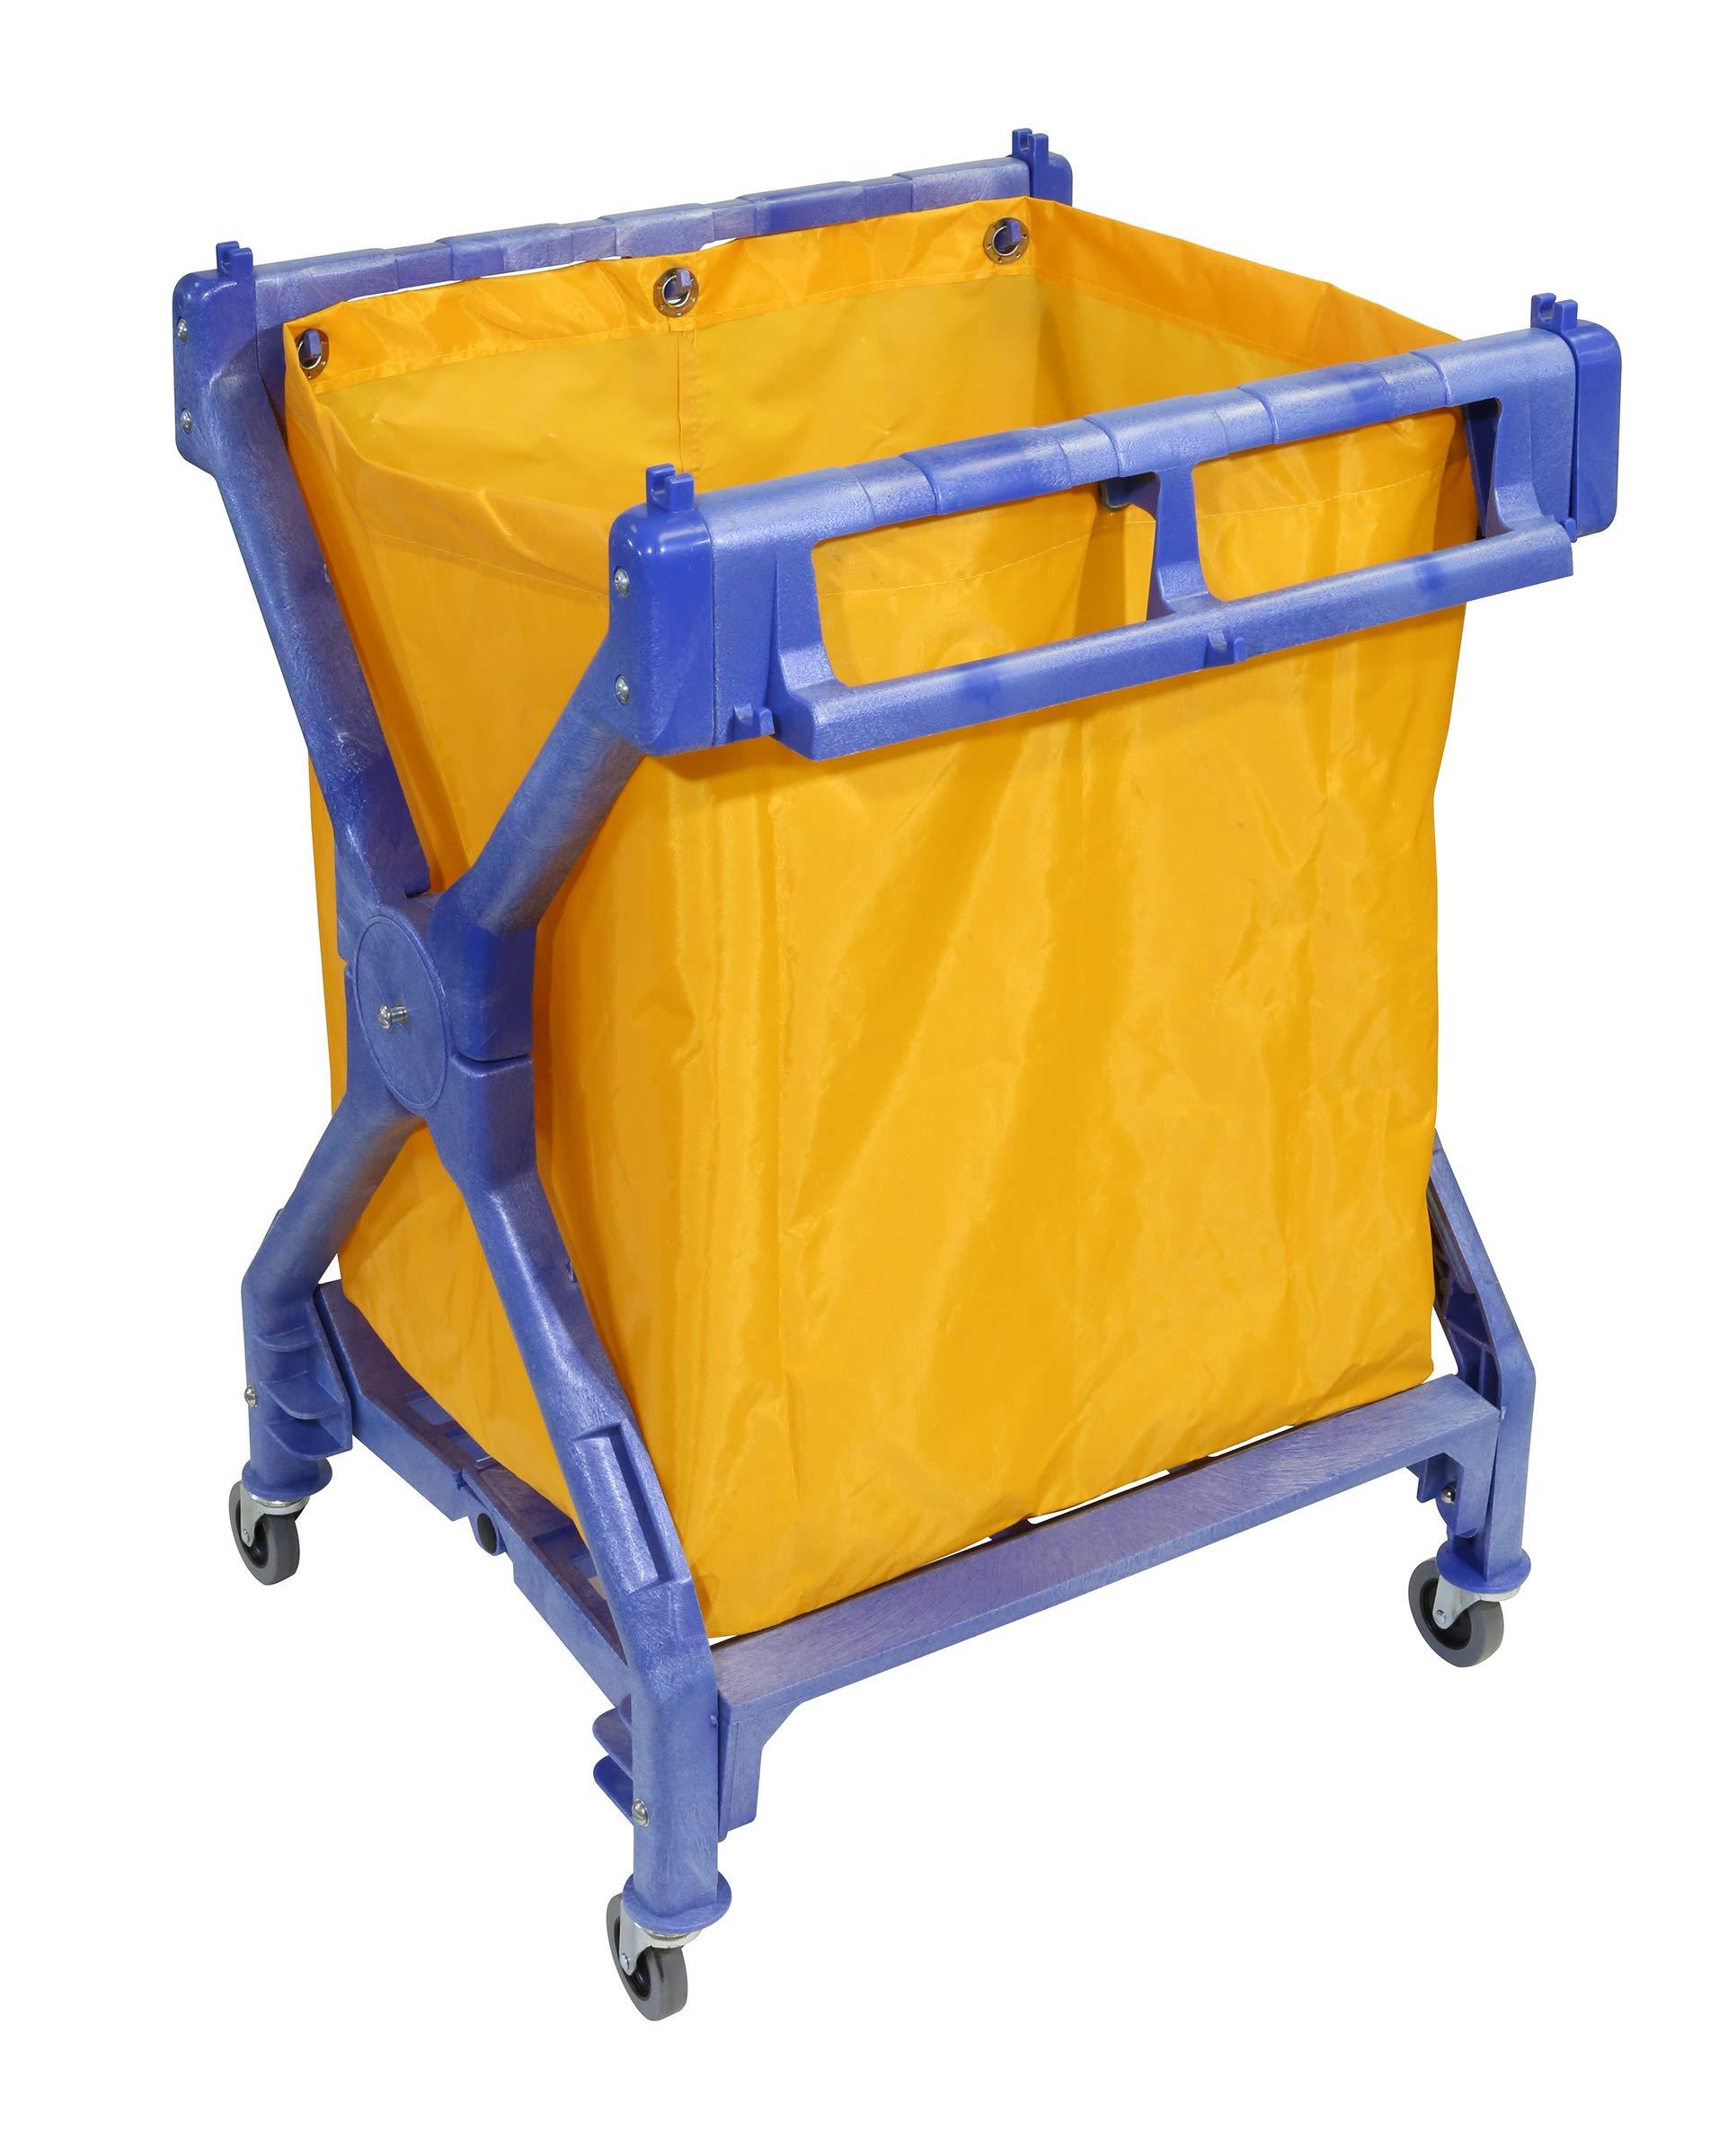 Oceeh|#O'cedar Commercial 96994 Maxirough X-Frame Cart